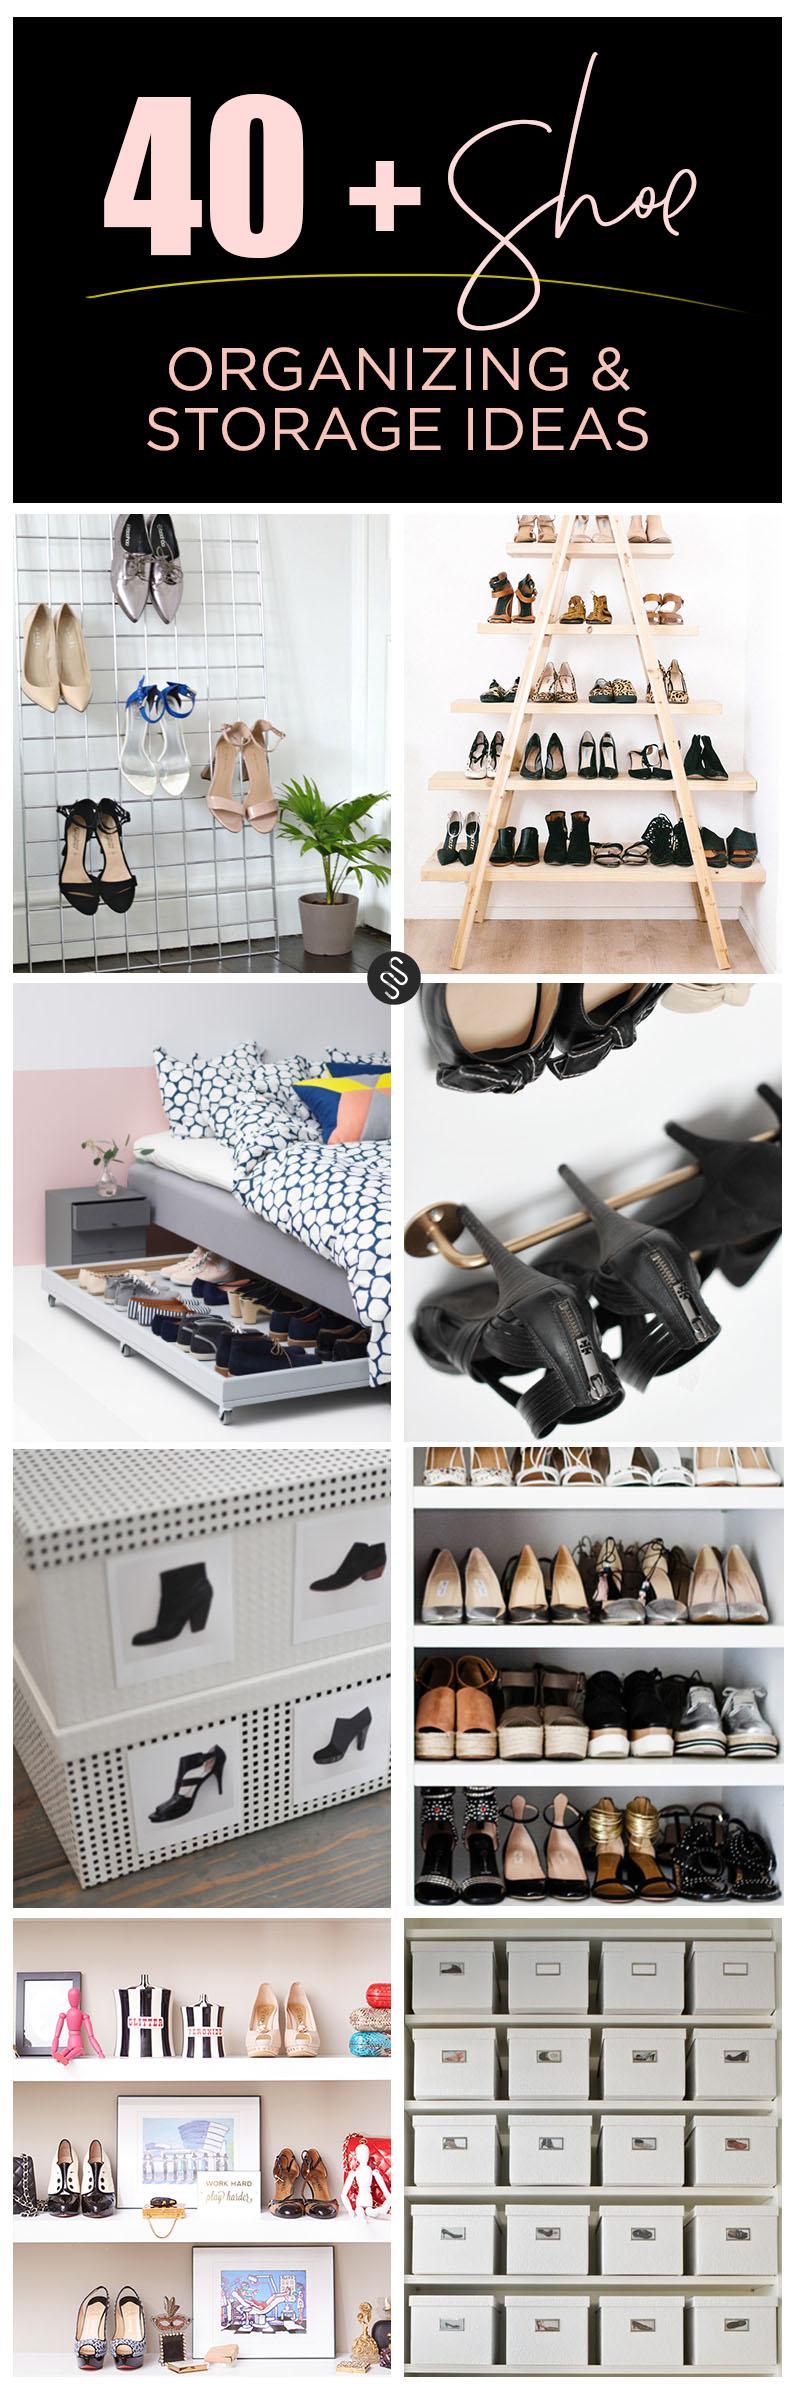 Shoe organizing and storage ideas // organized home // storage solutions // closet organizing // www.SimplySpaced.com